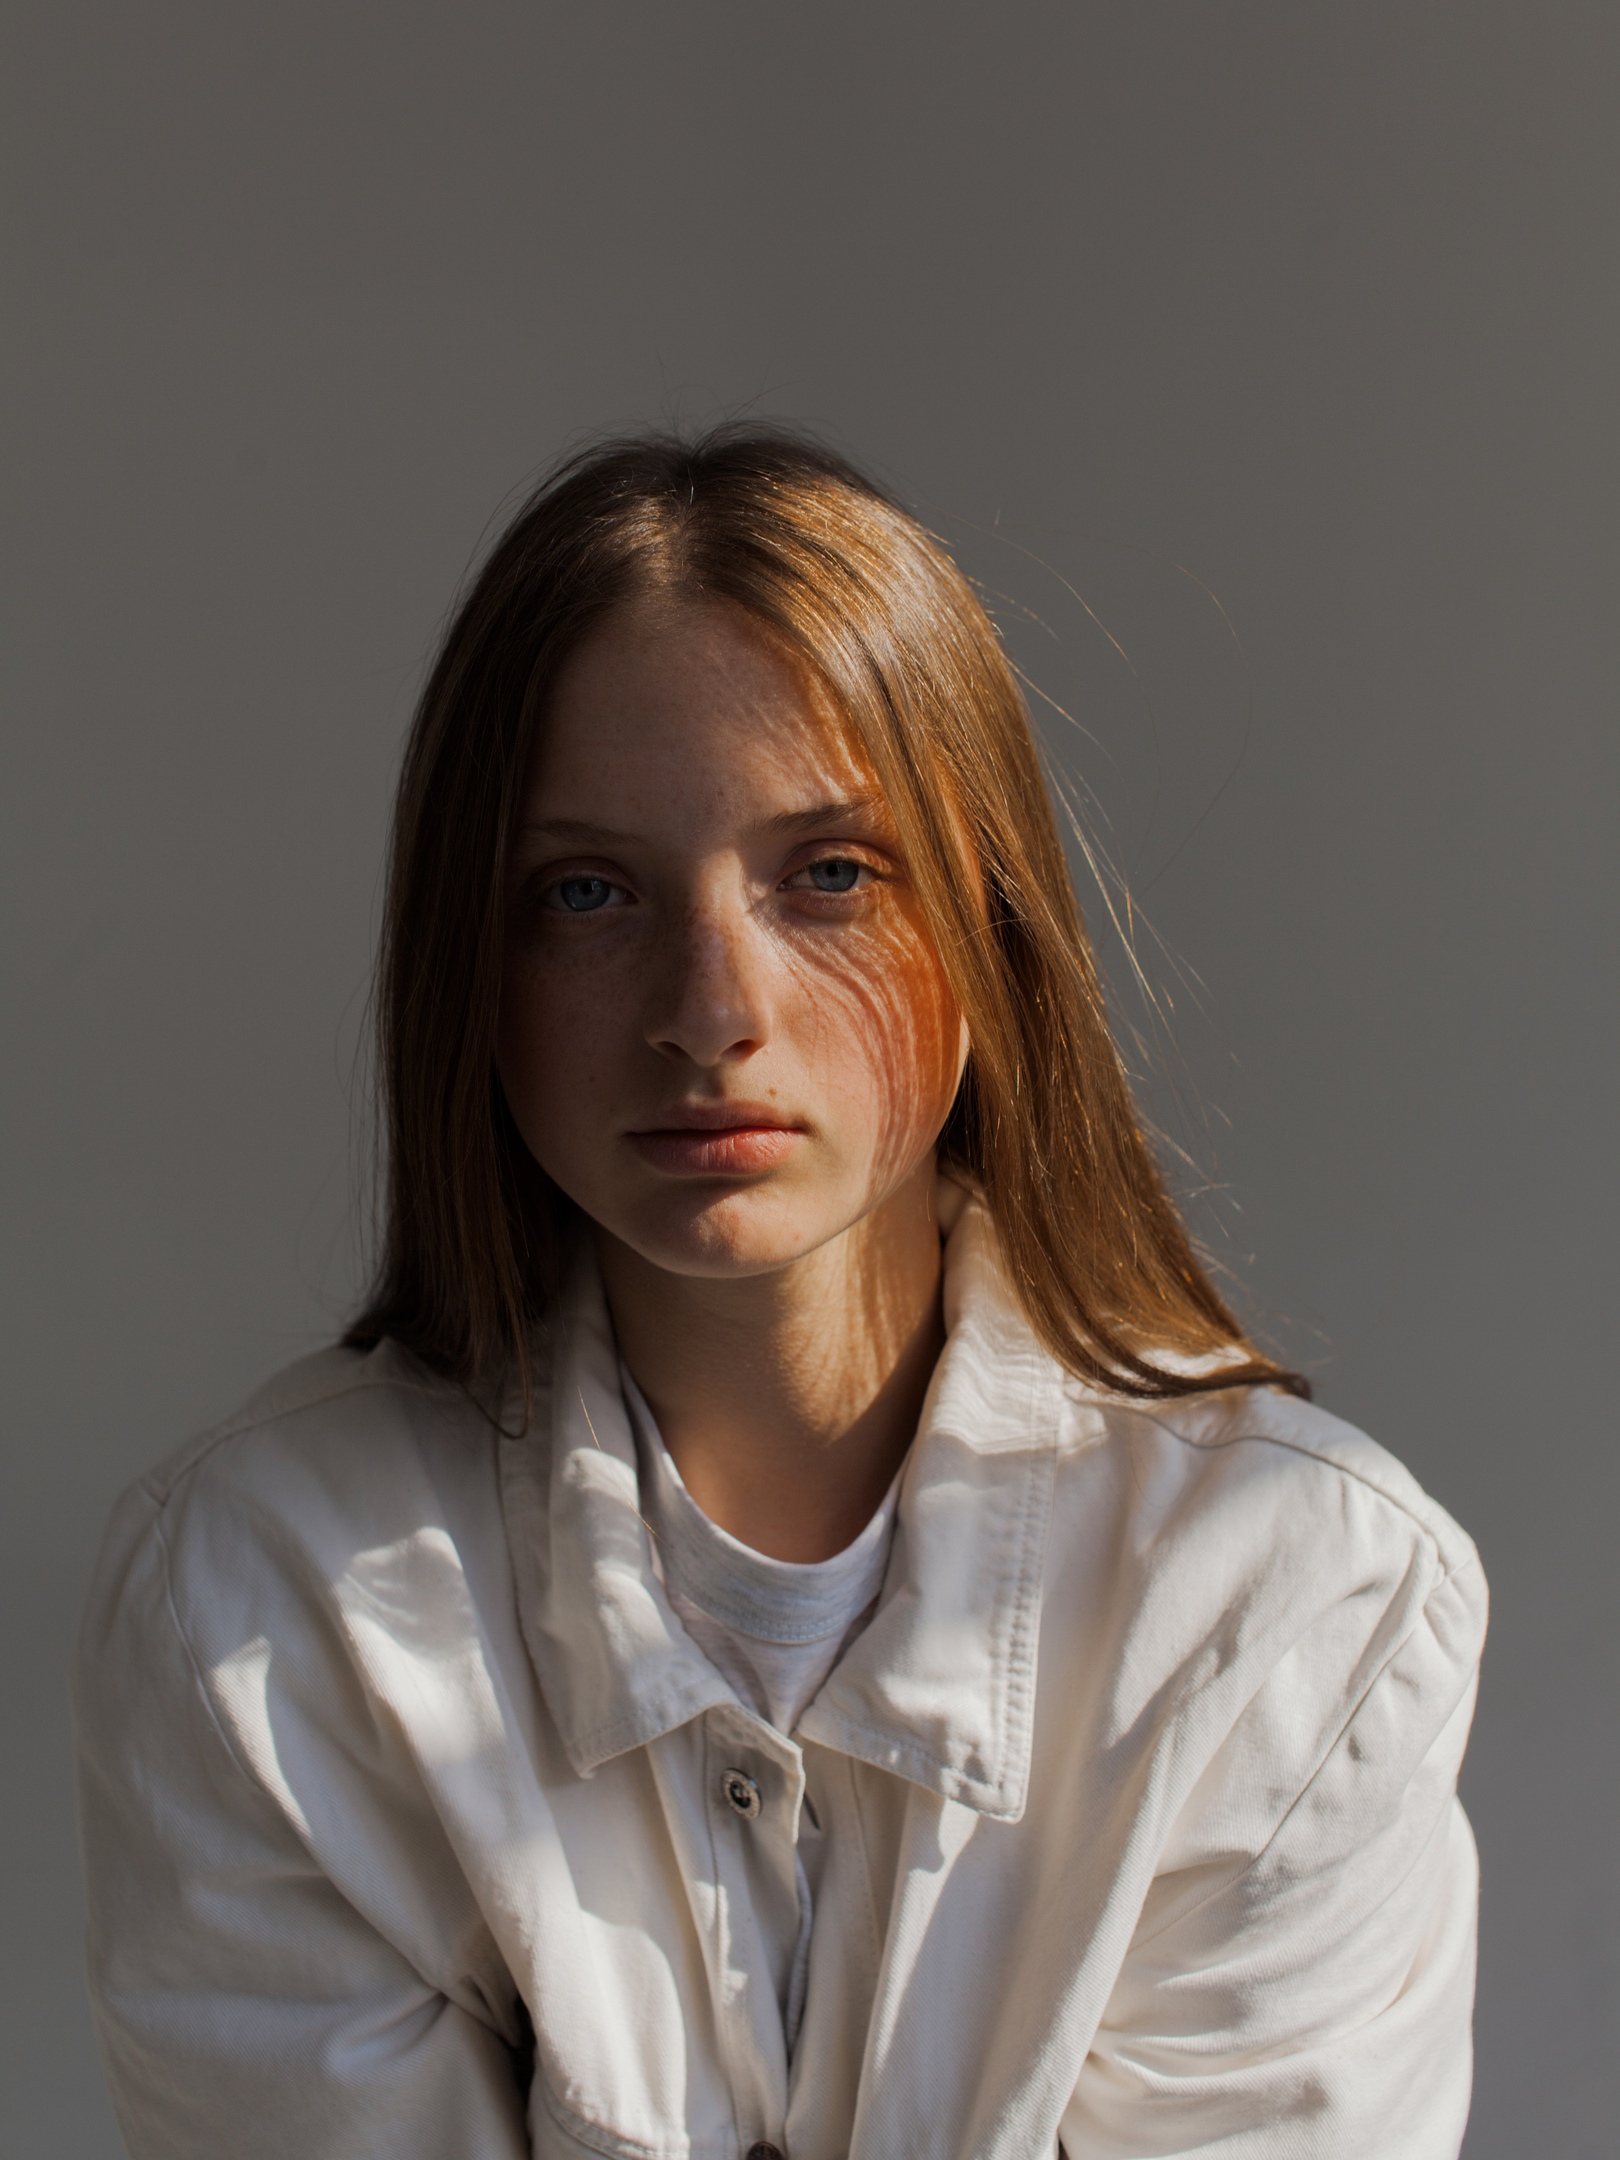 Marta Viidas by Ira Chaschina